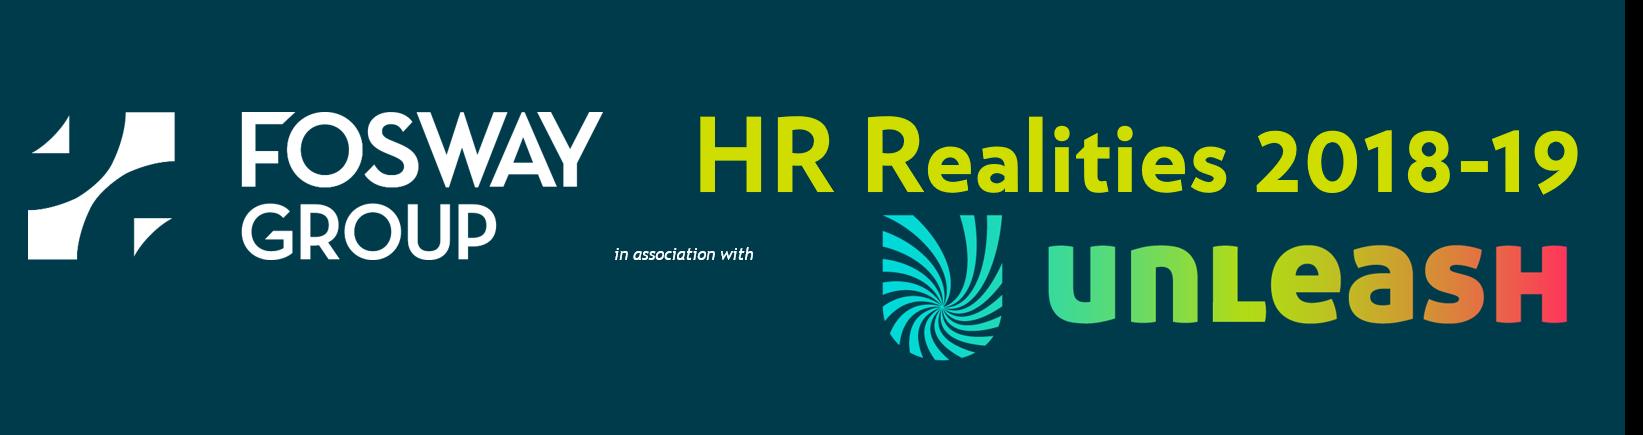 Fosway UNLEASH HR Realities 2018-19 Web banner